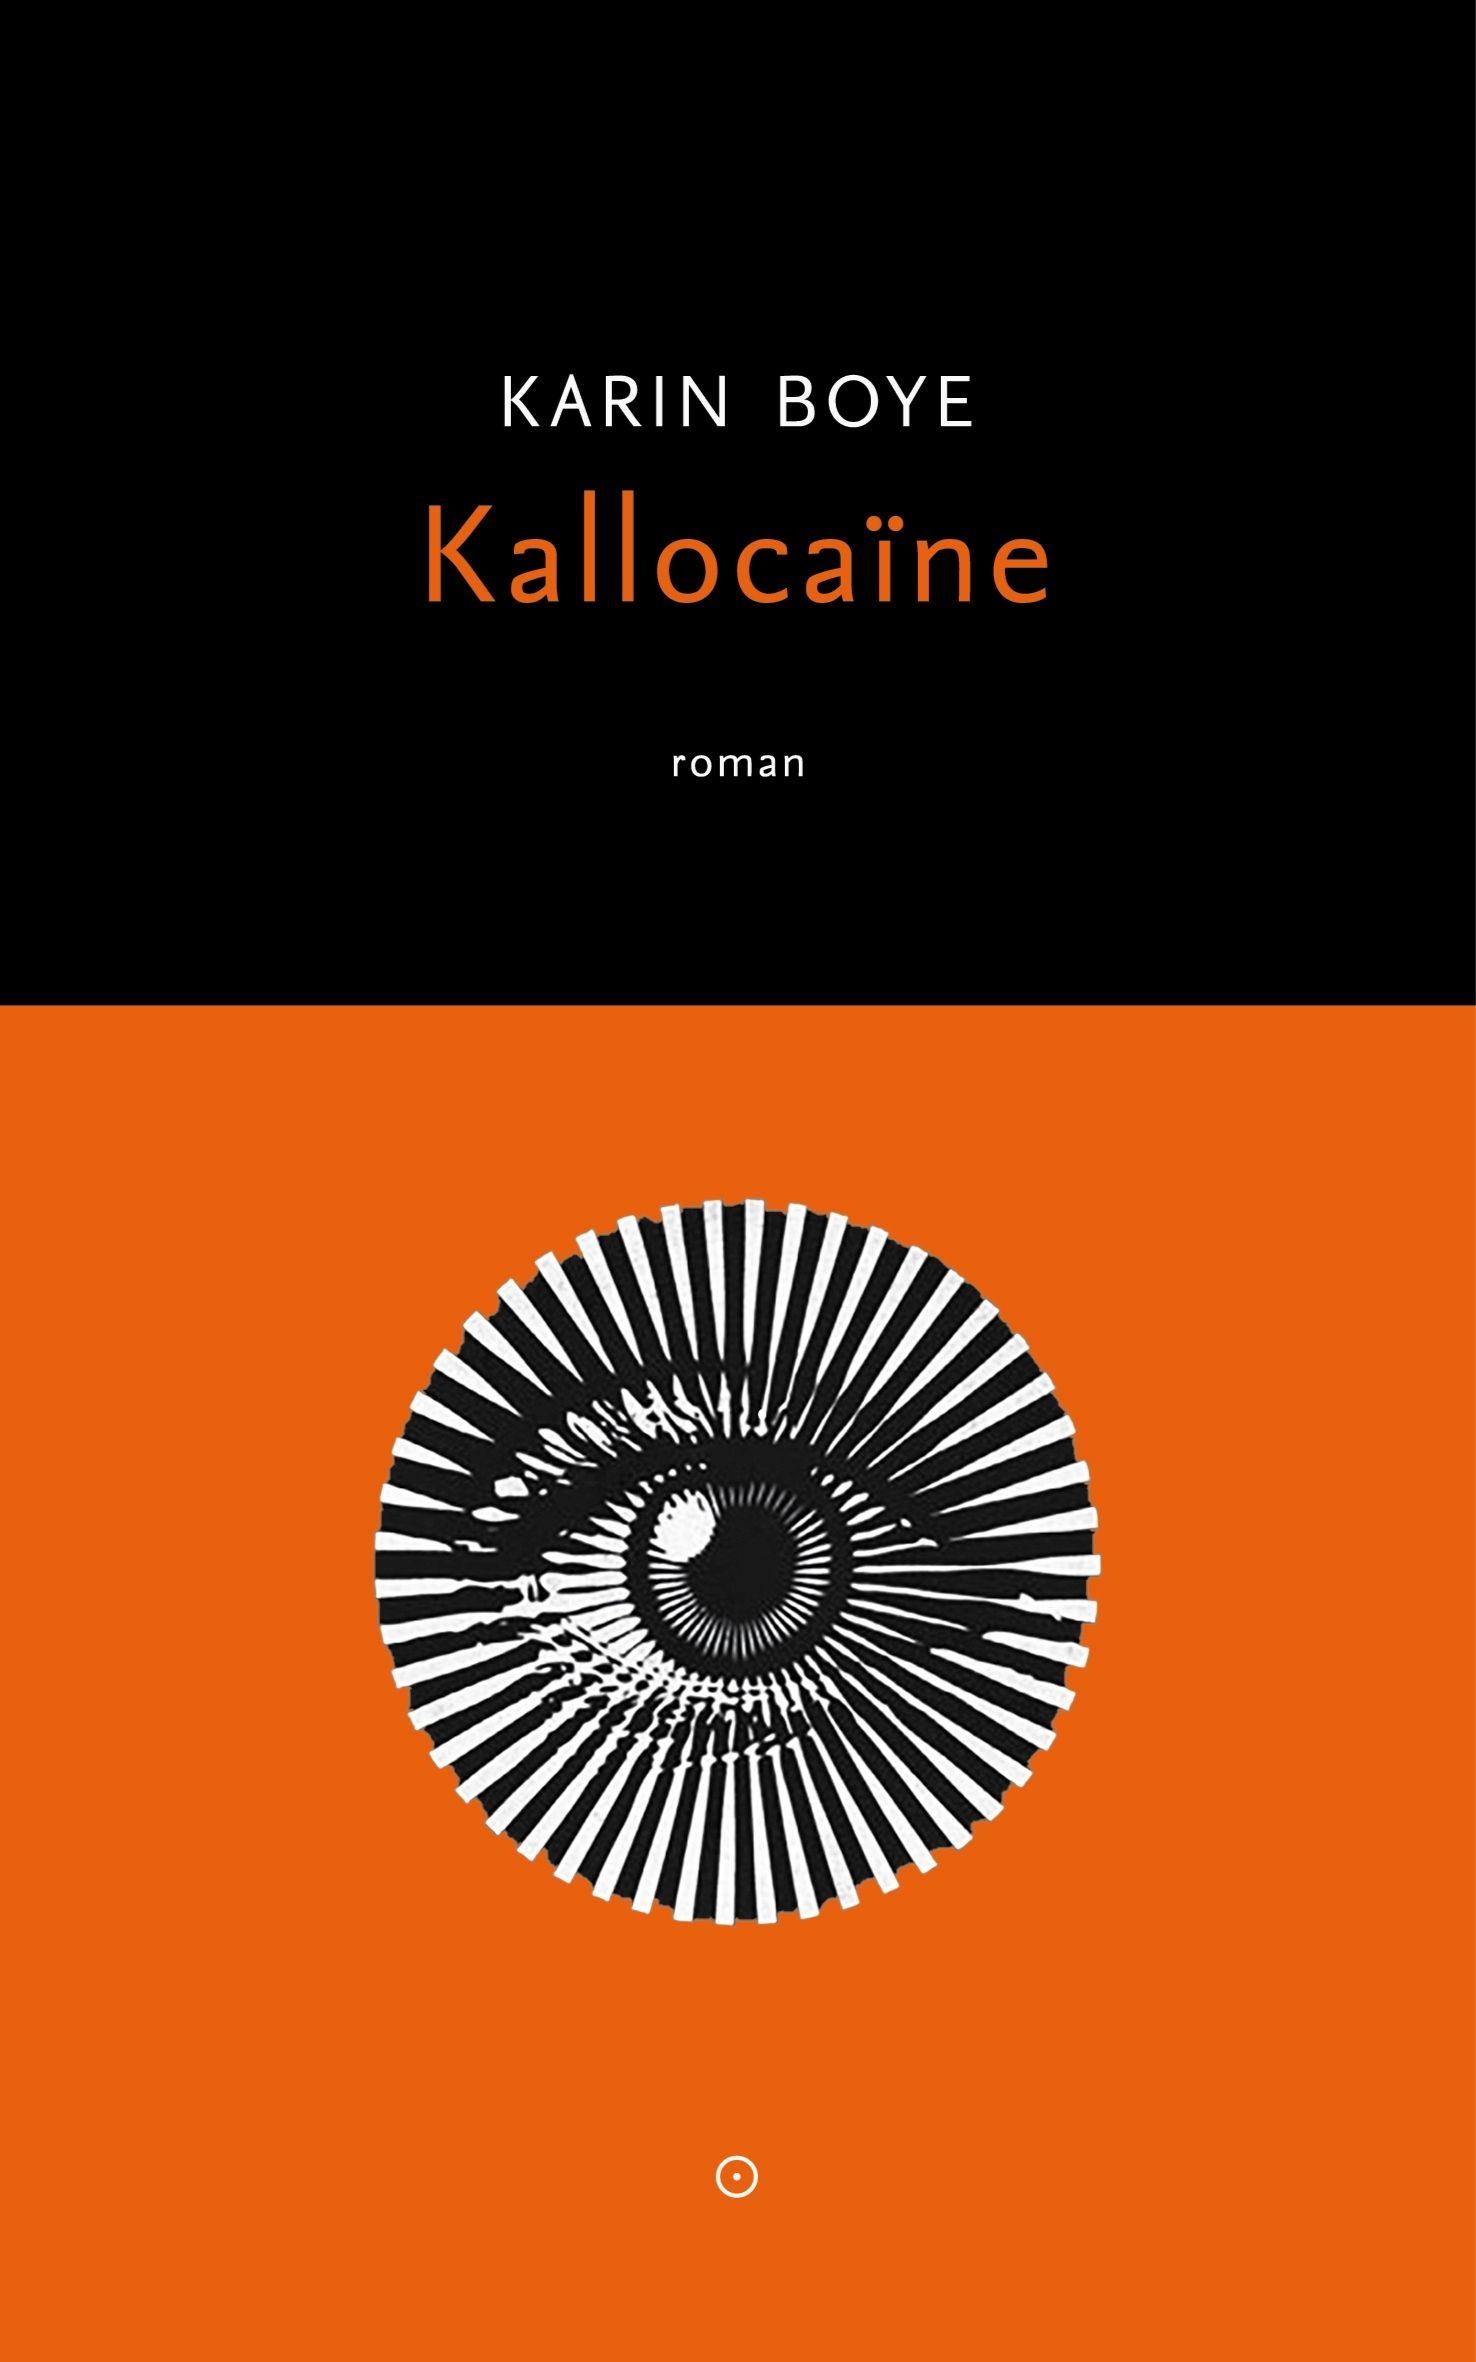 Kallocaine - Karin Boye - Uitgeverij Koppernik